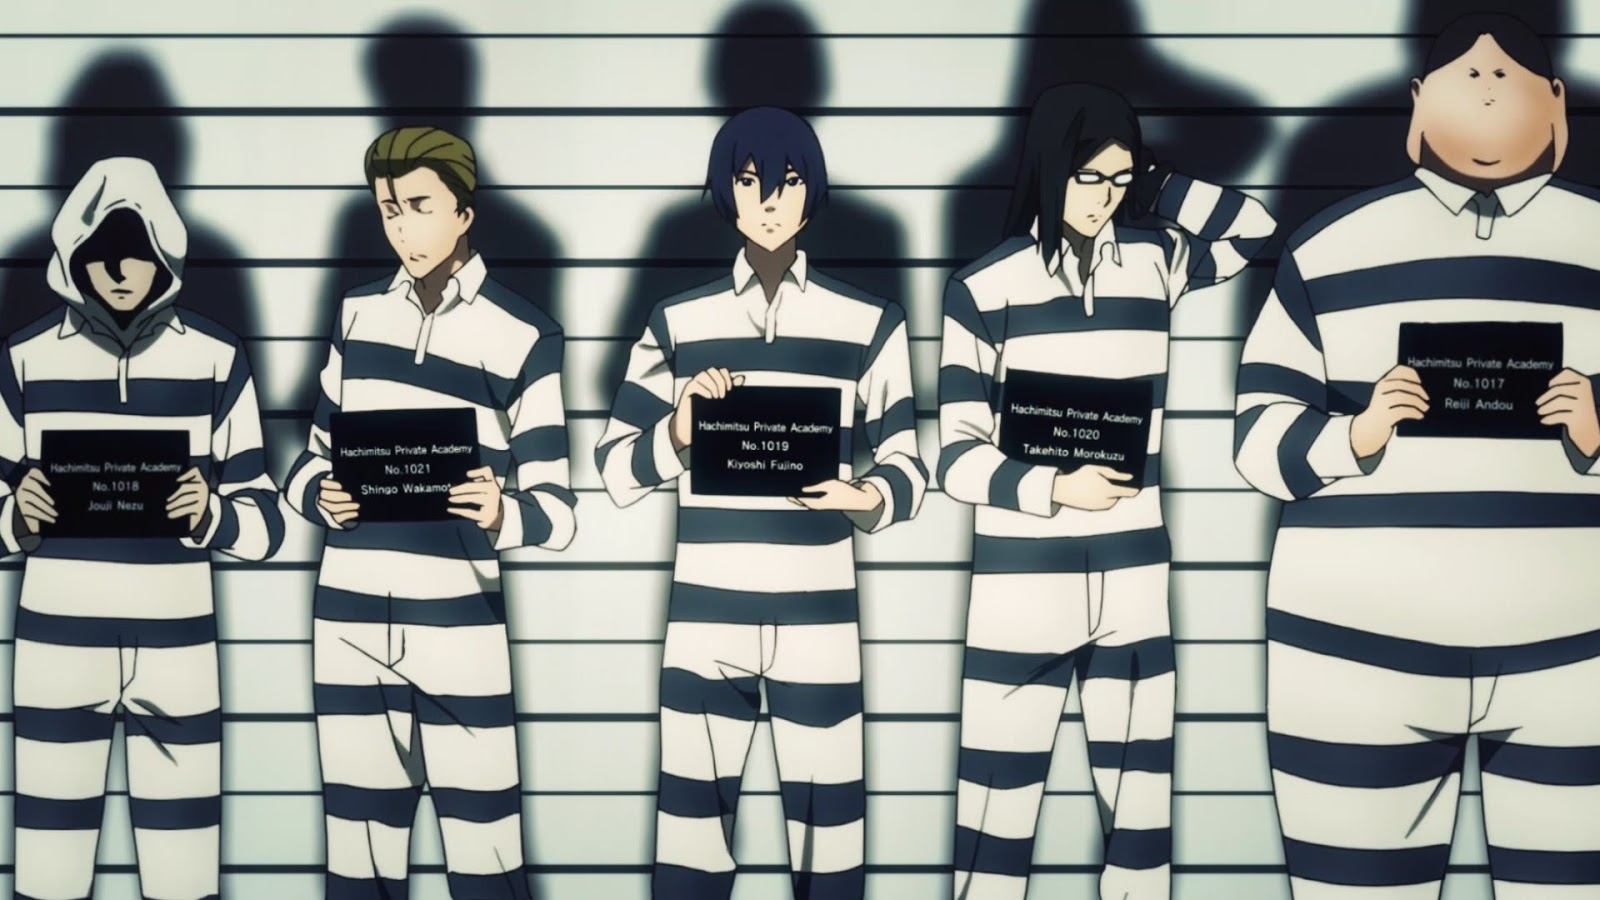 Prison School Wallpaper 1600x900